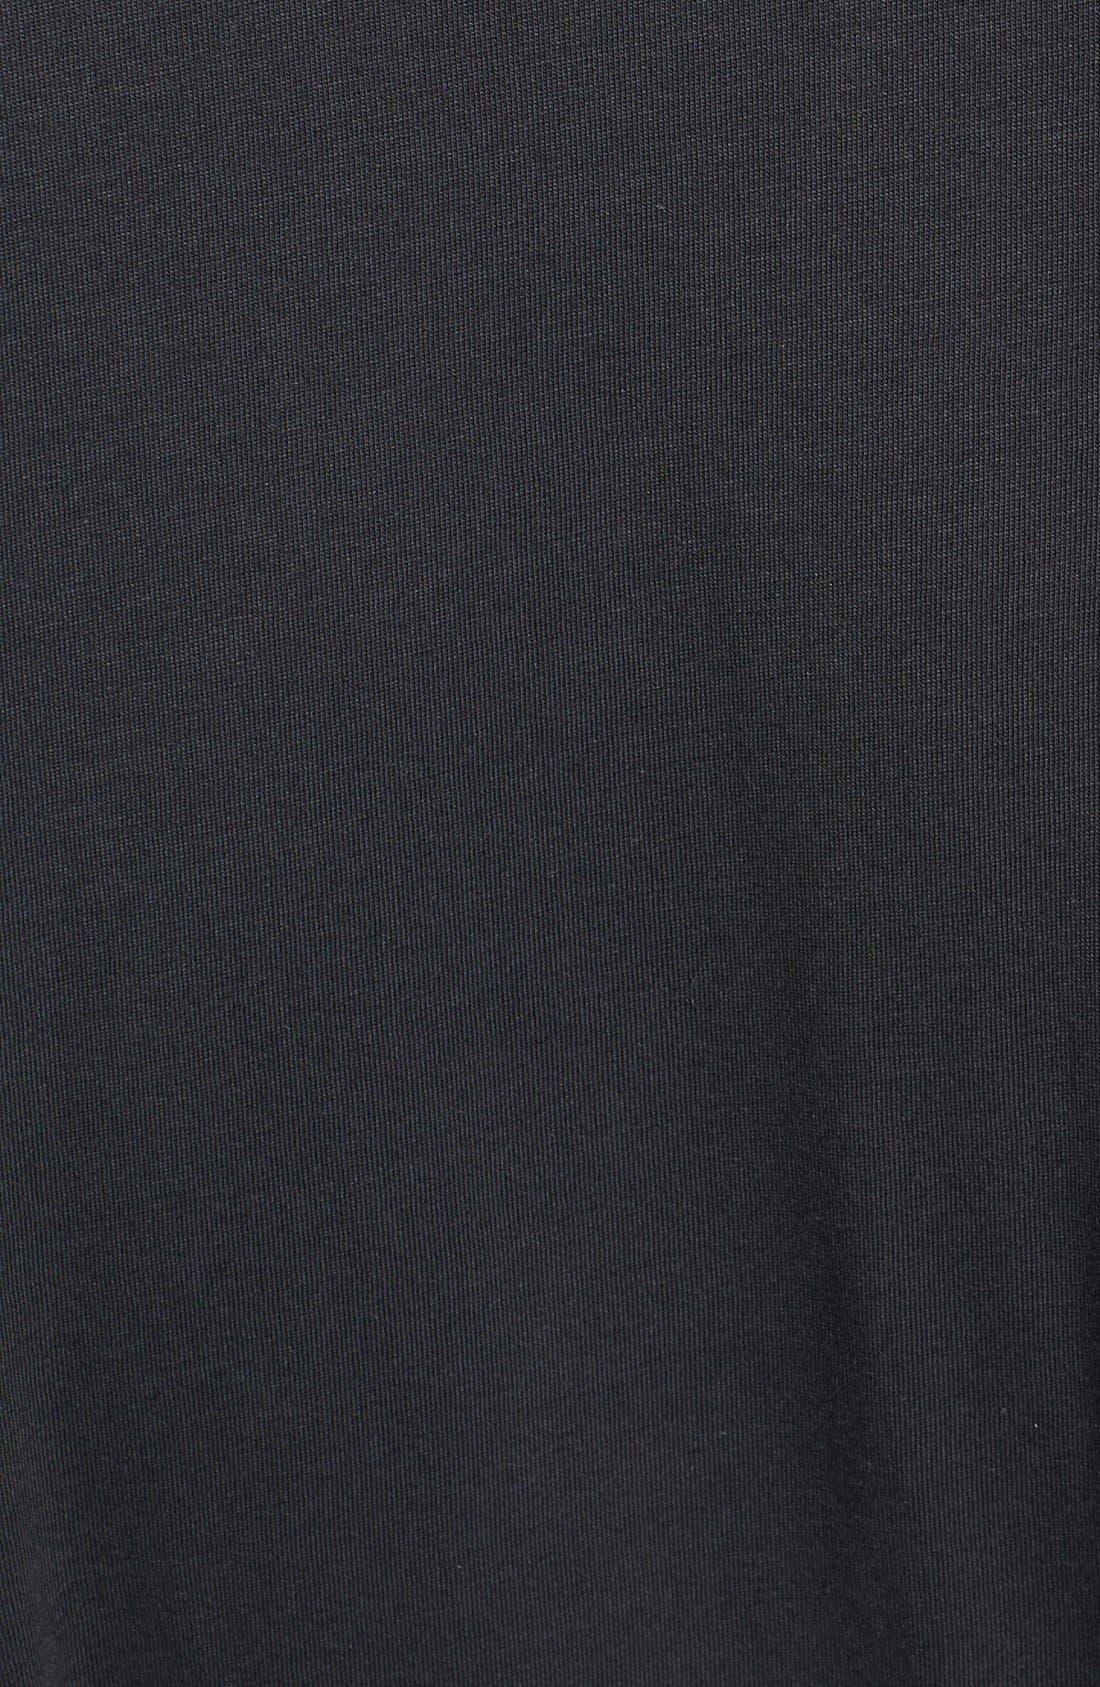 Alternate Image 3  - Daniel Buchler Peruvian Pima Cotton Robe